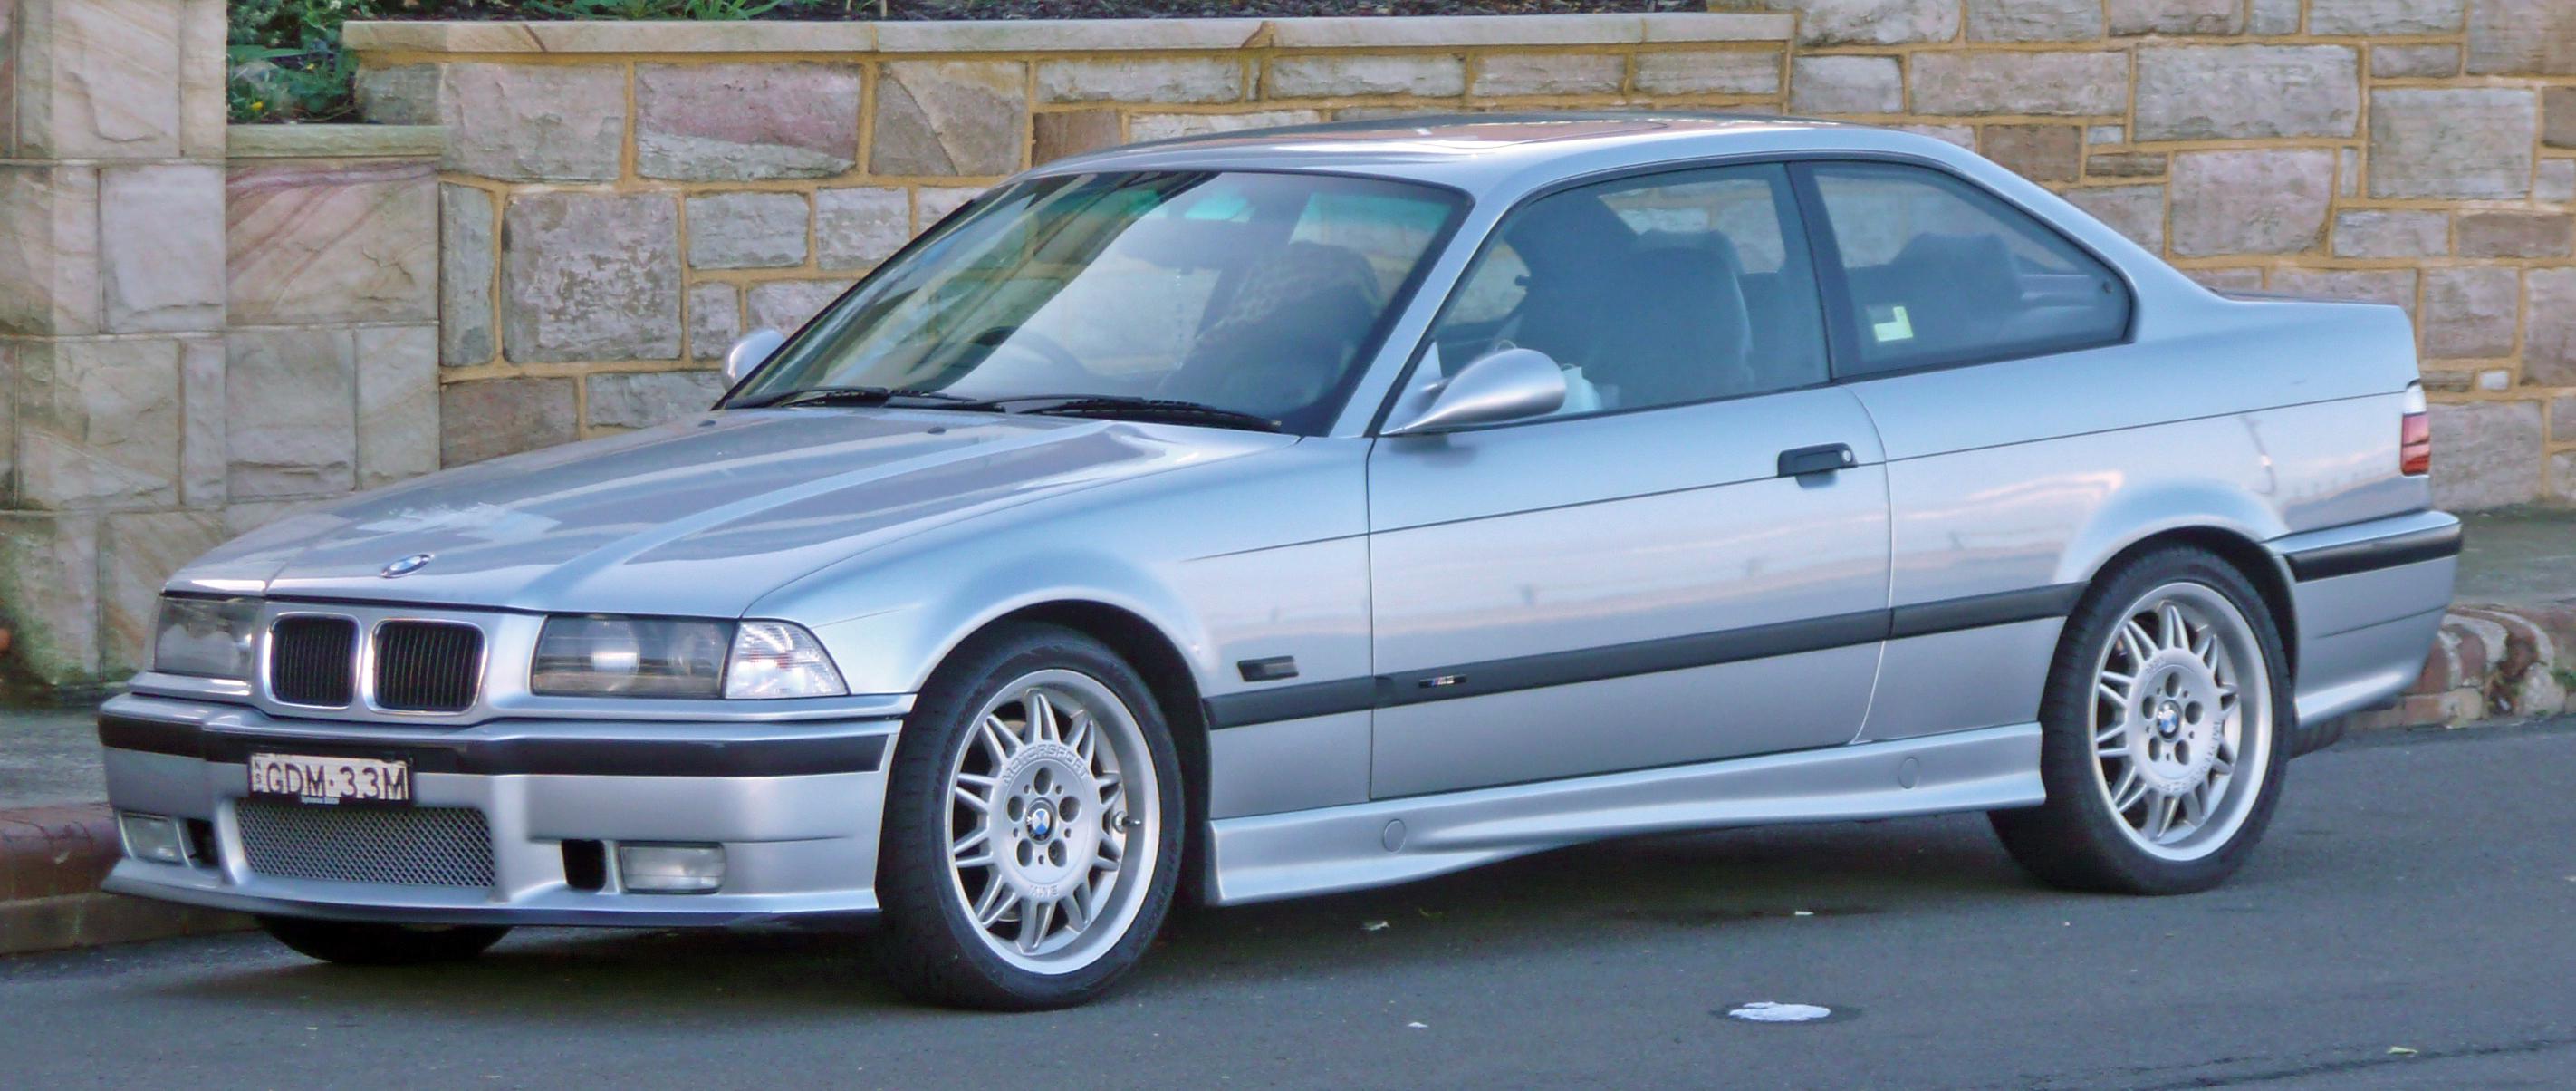 File 1995 1999 Bmw M3 E36 Coupe 01 Jpg Wikimedia Commons